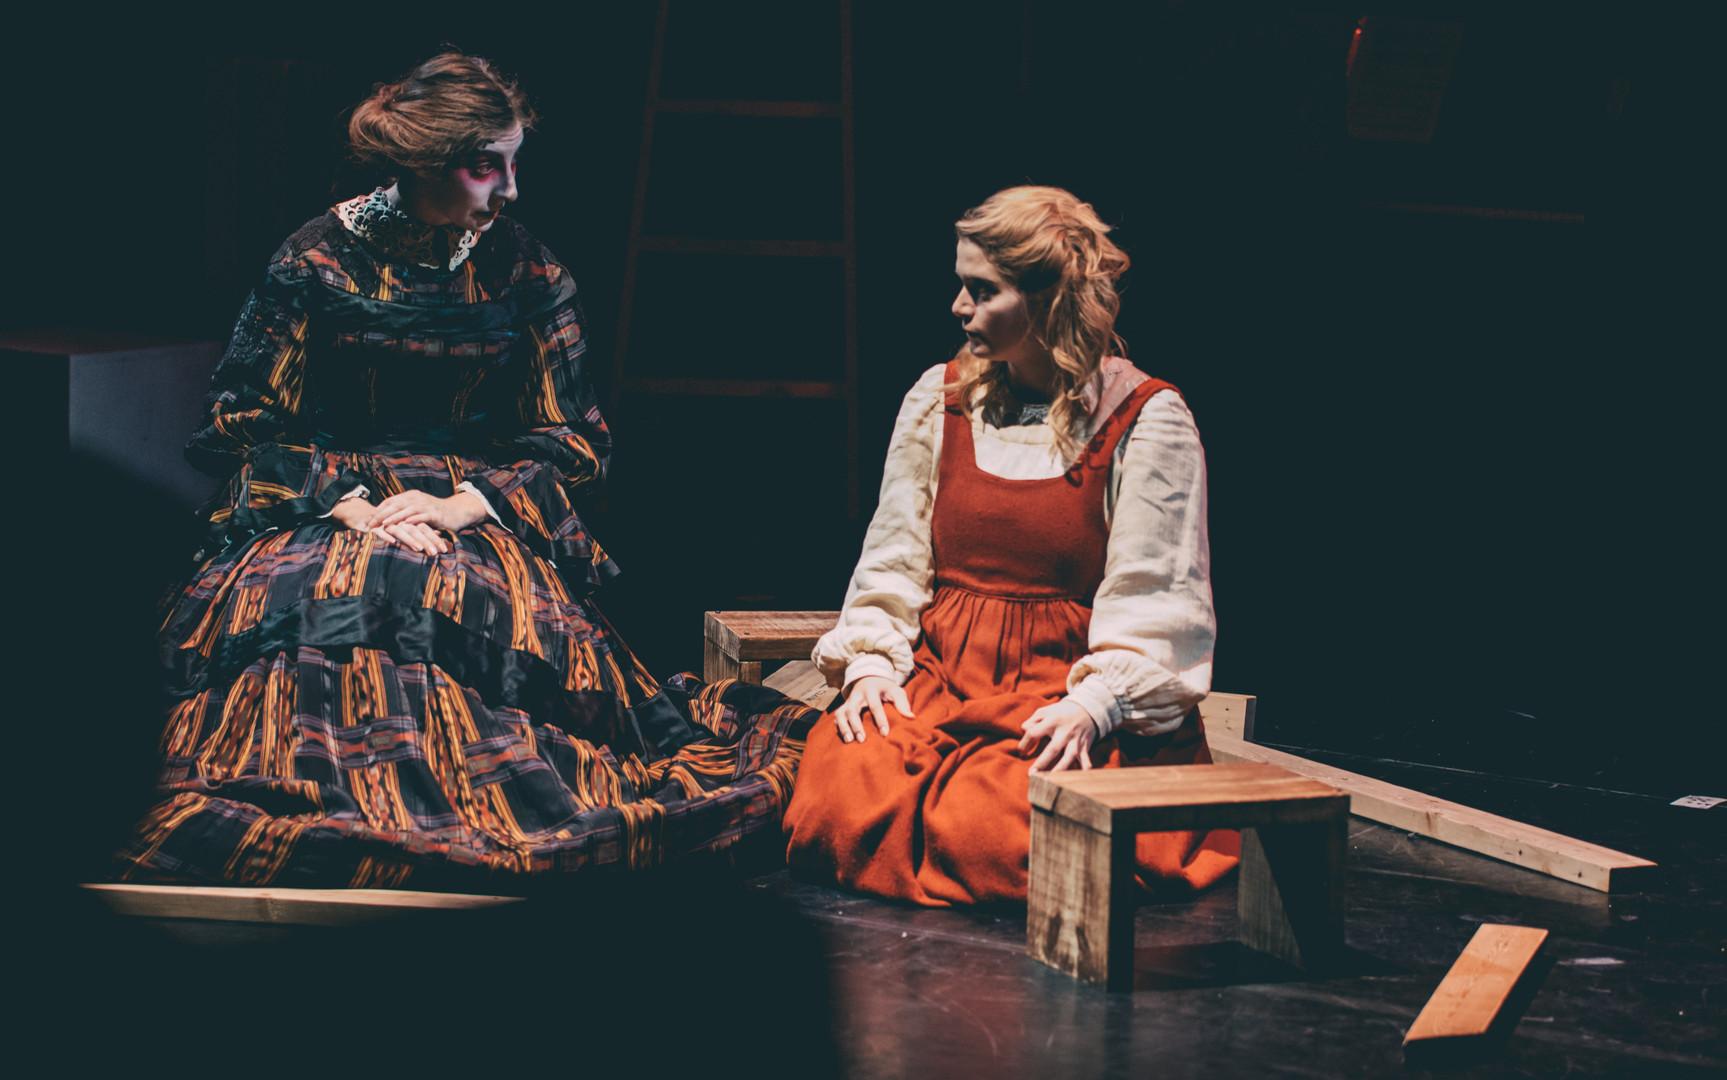 Your Alice at The Edinburgh Fringe Festival 2018